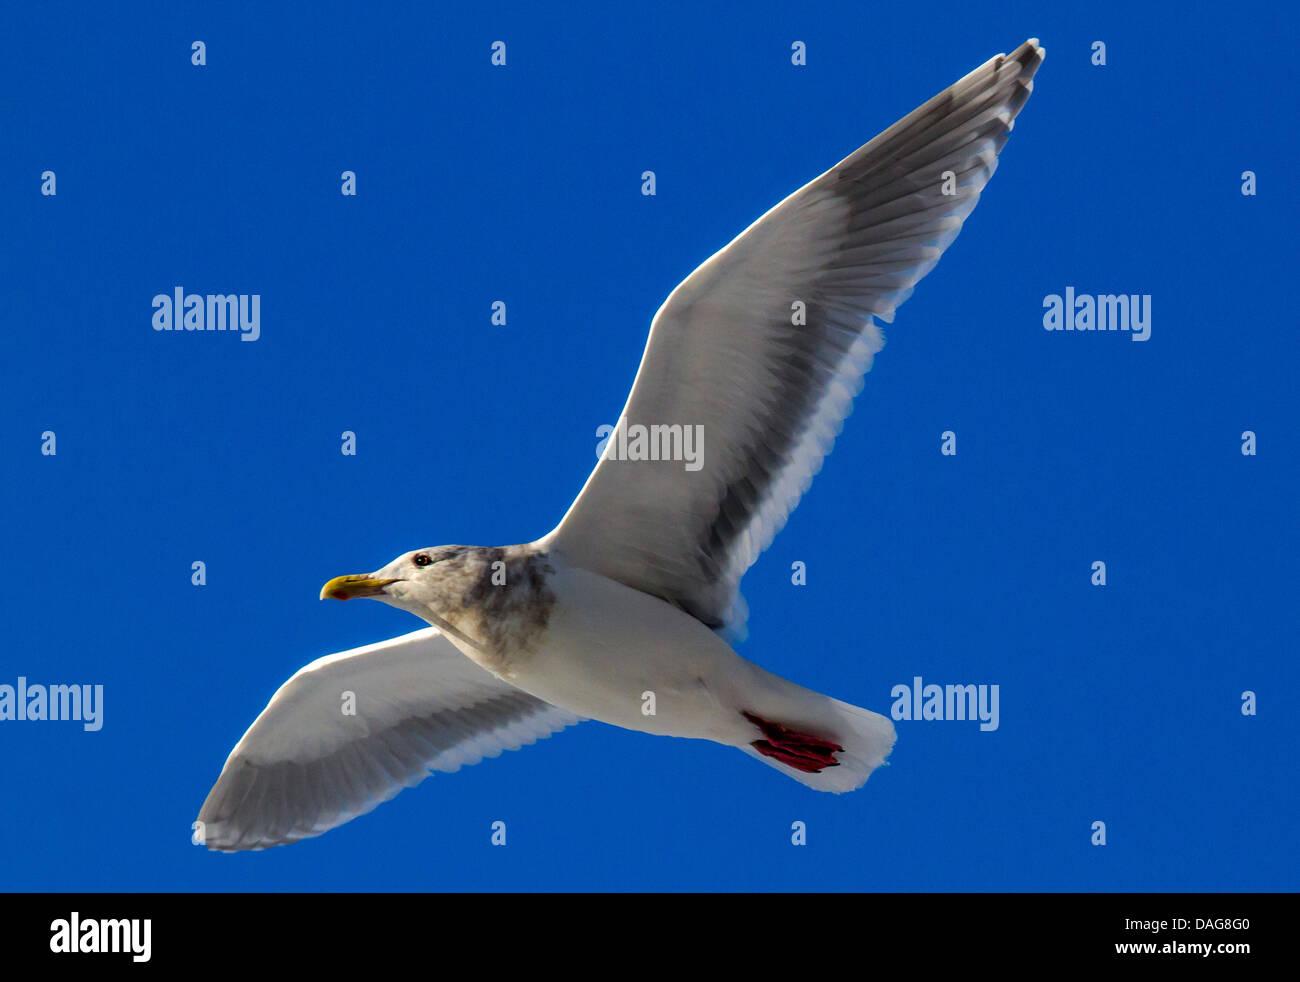 glaucous-winged gull (Larus glaucescens), flying, USA, Alaska, Chilkat Bald Eagle Preserve - Stock Image